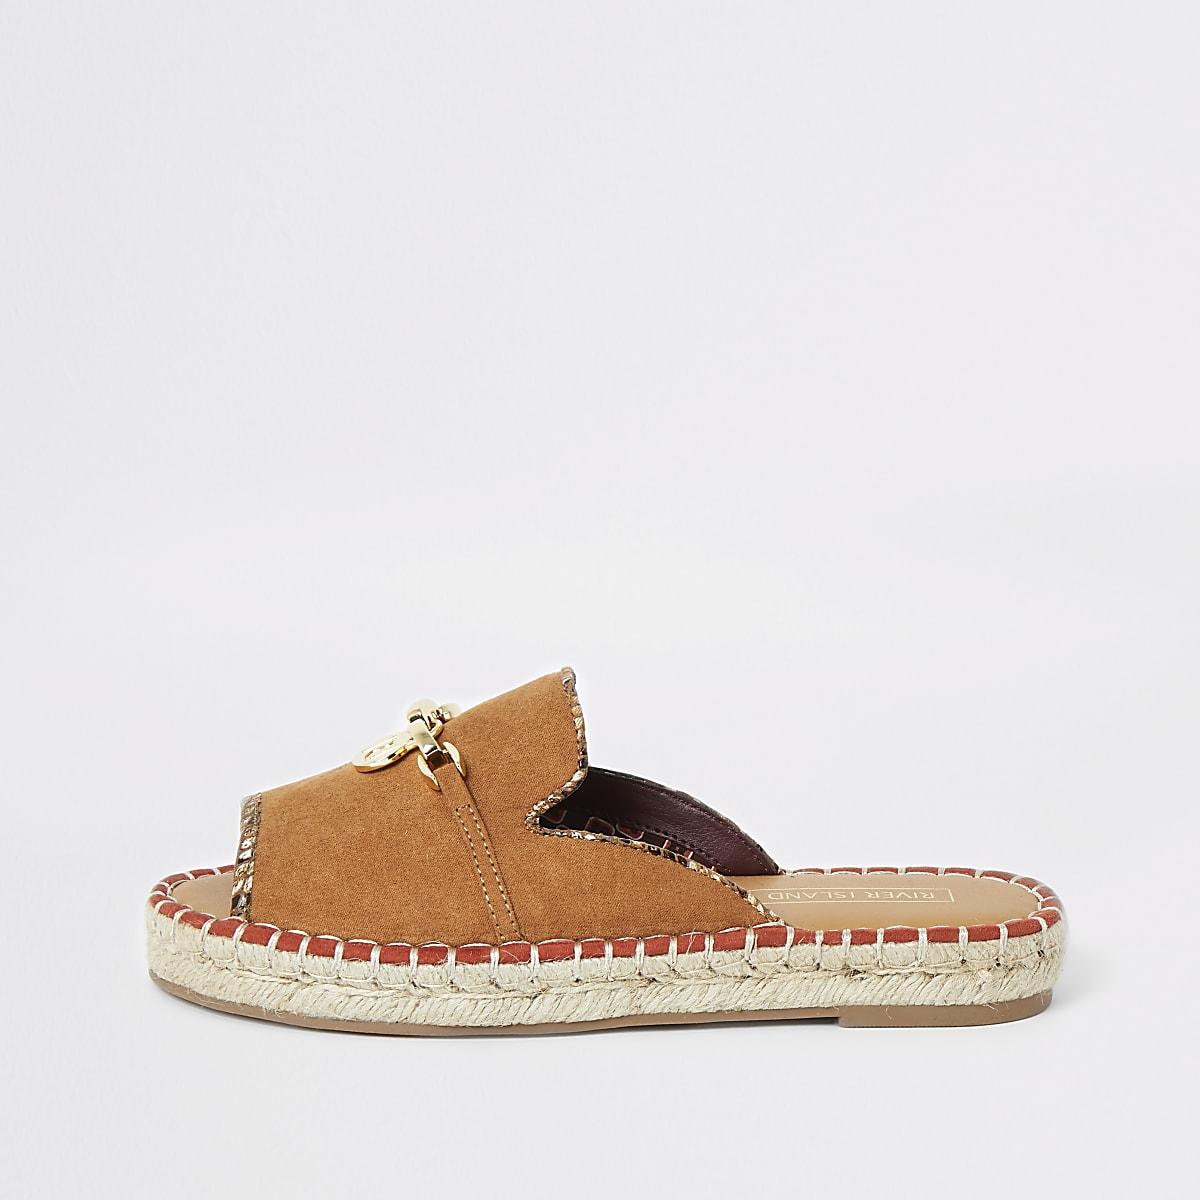 Sandales peep toe marron style espadrilles